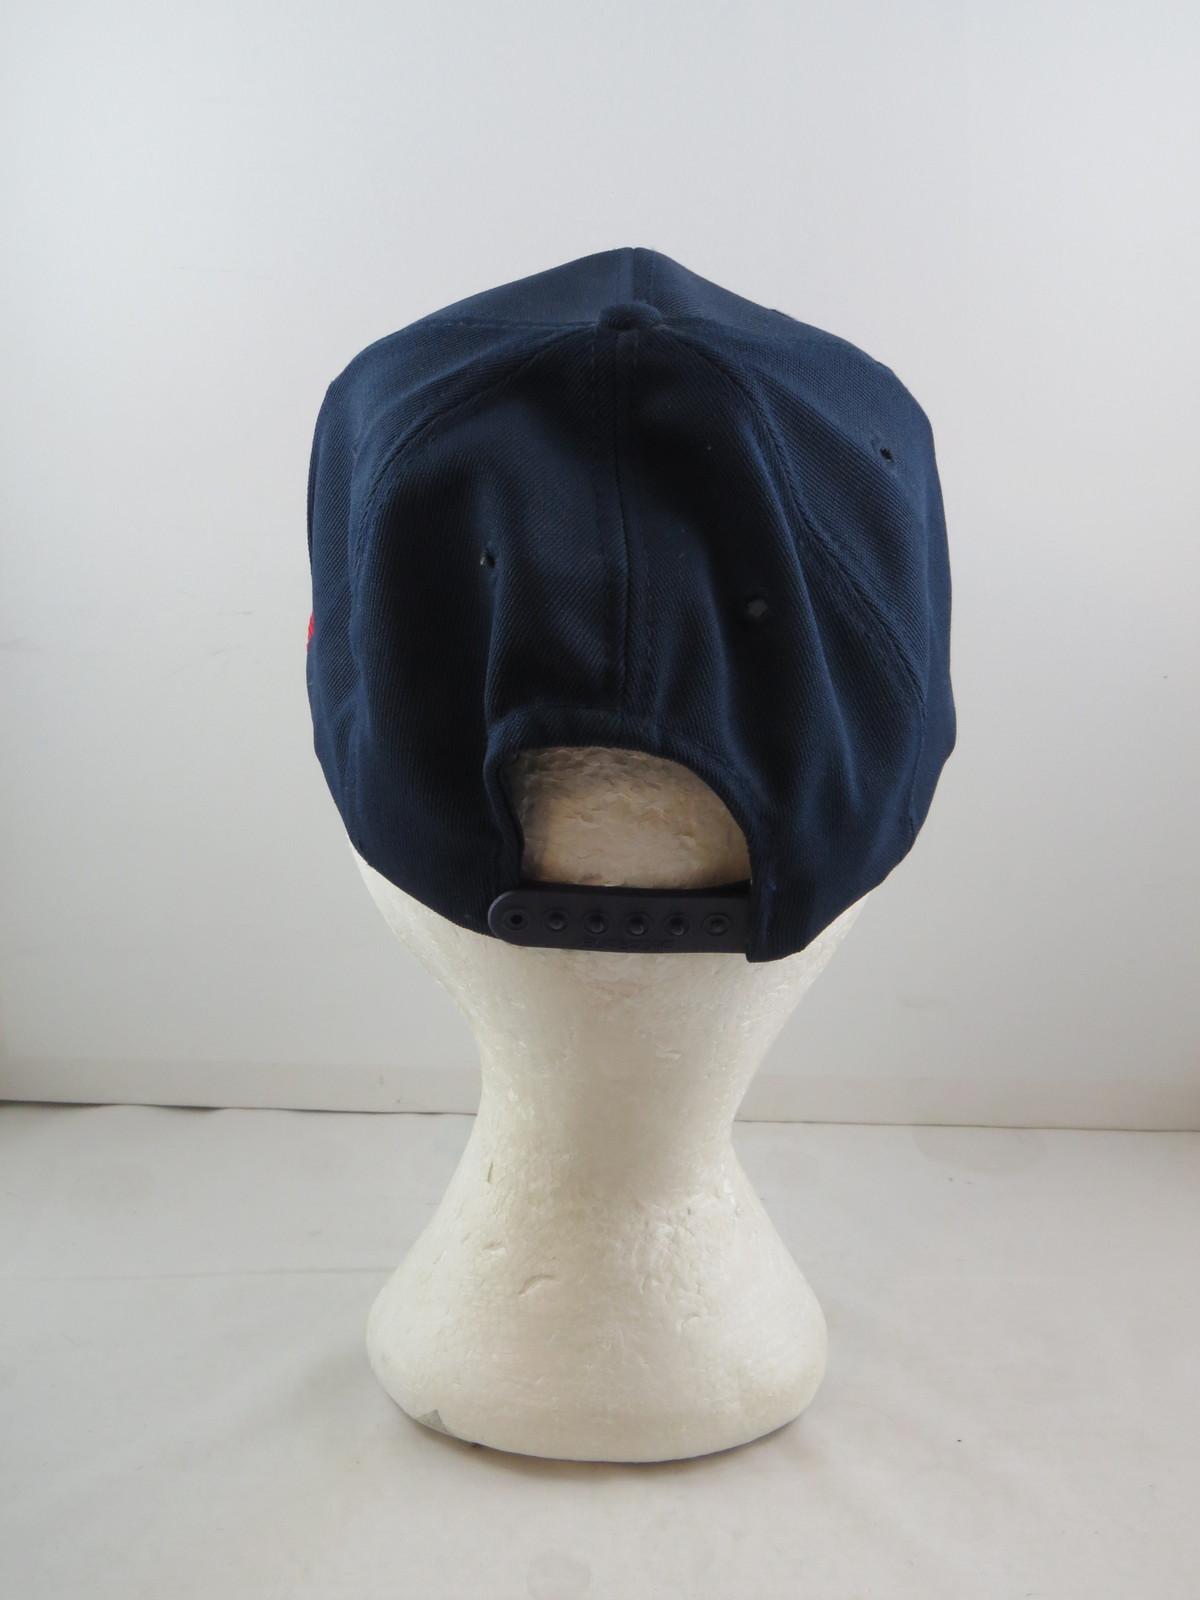 Cleveland Indians Hat (VTG) - 1970s All Polyester by Twins - Adult Sanpback